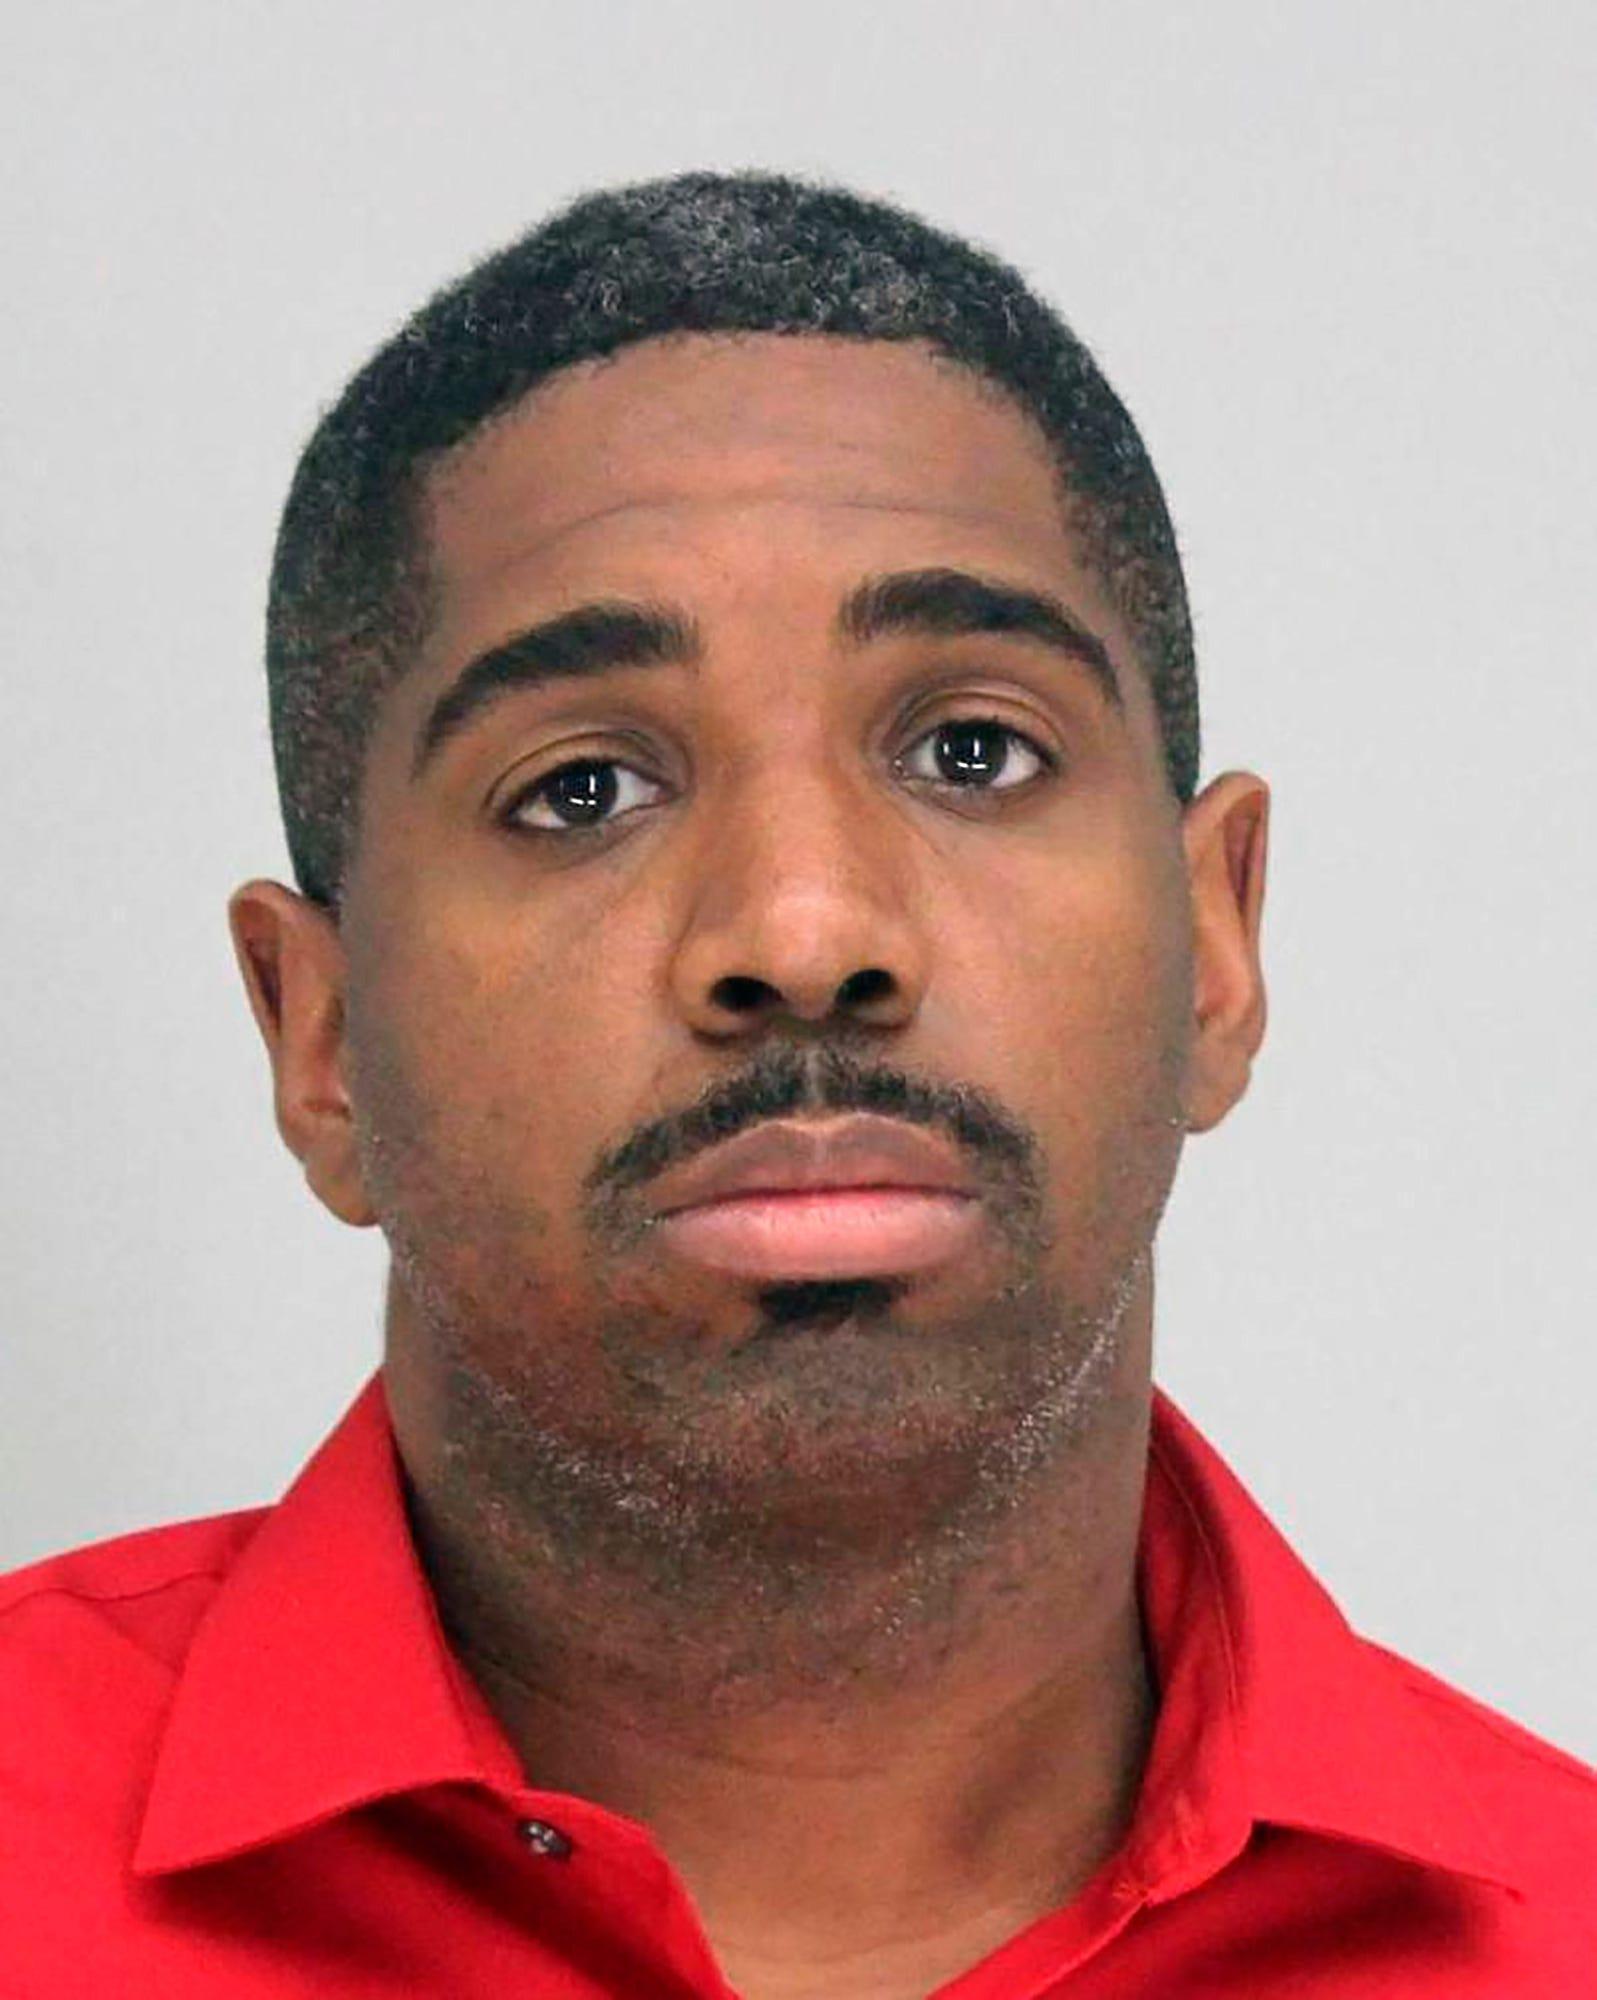 FBI denies asking Dallas to keep suspect officer on job 2